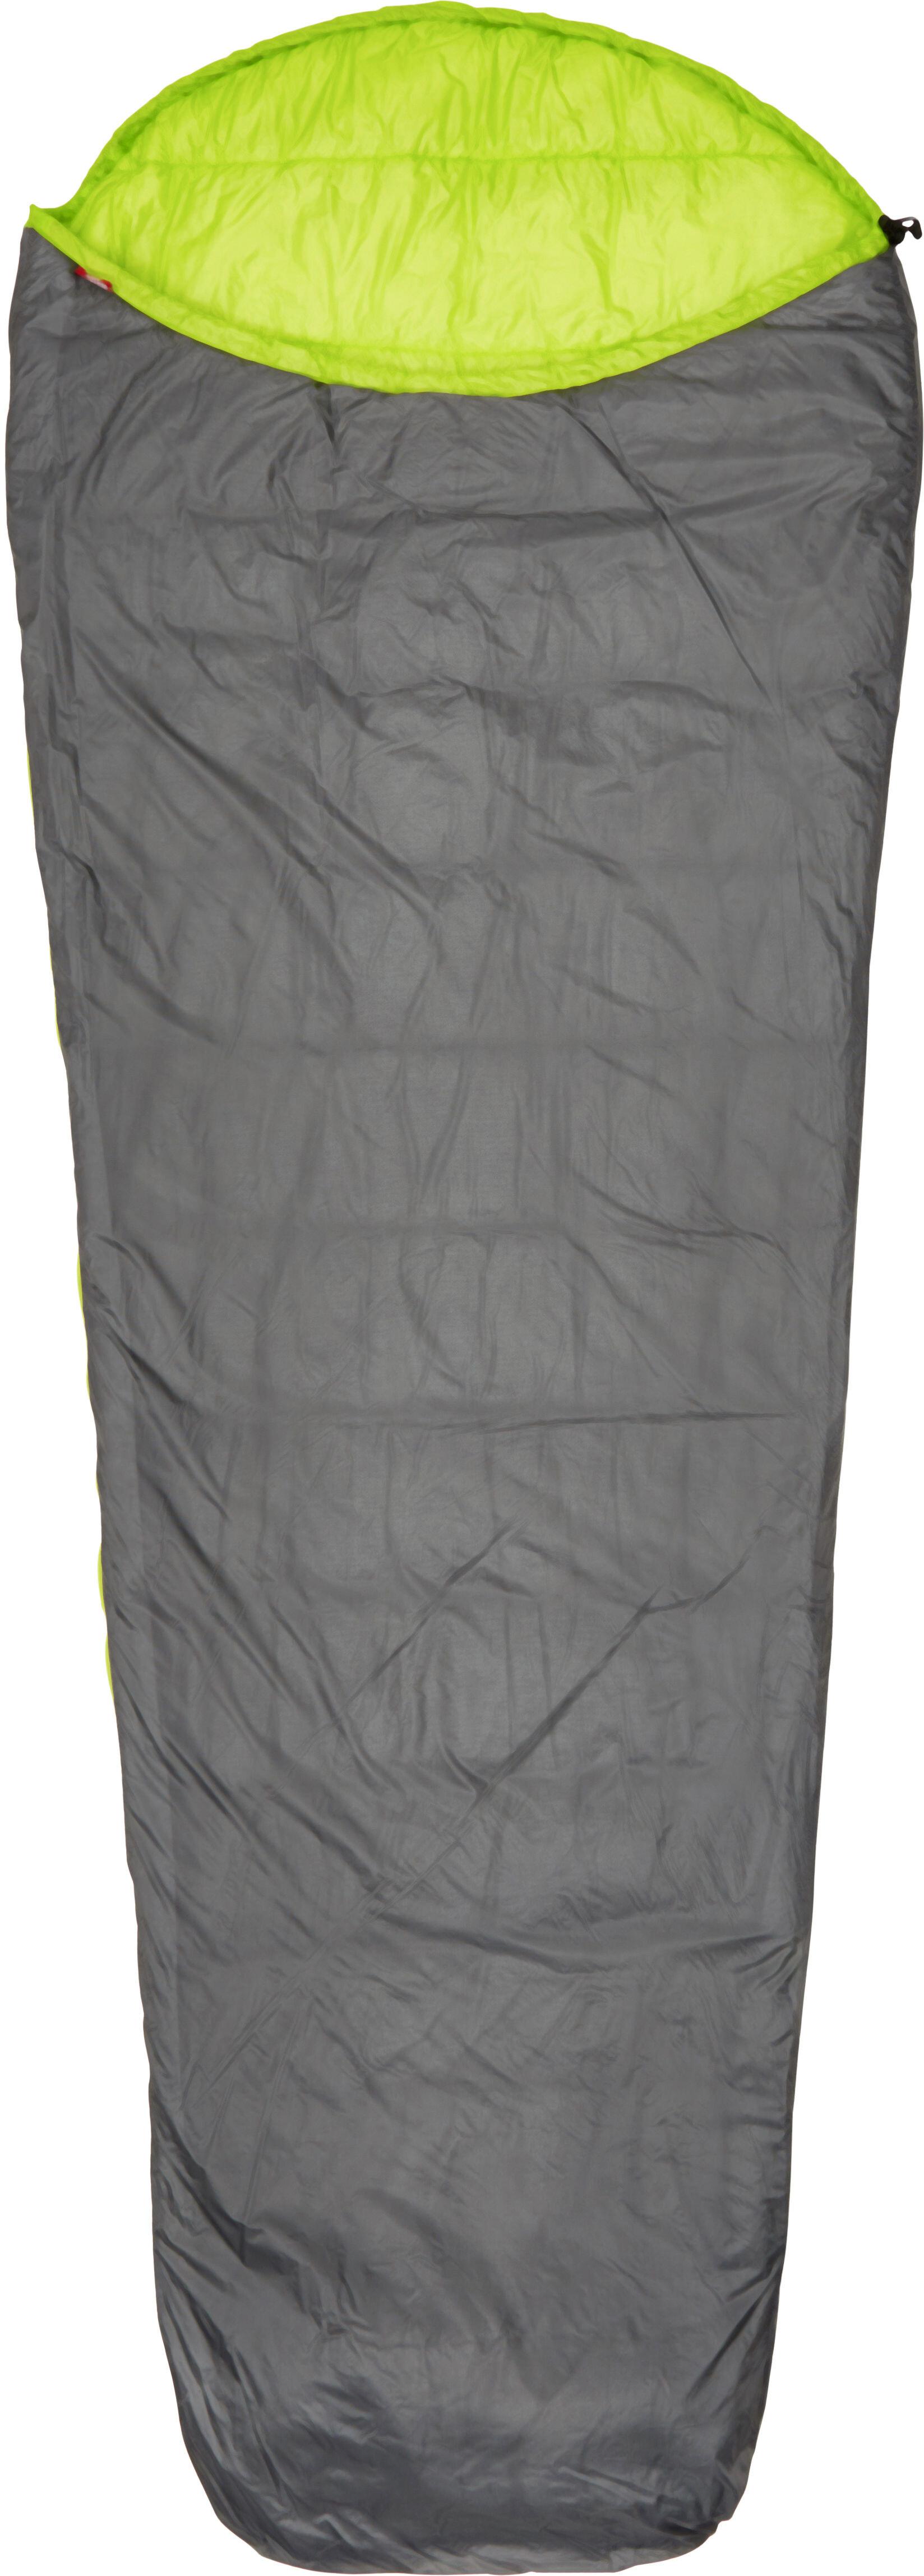 18°C Regular electric sky 2019 Schlafsack Mountain Hardwear Lamina Sleeping Bag